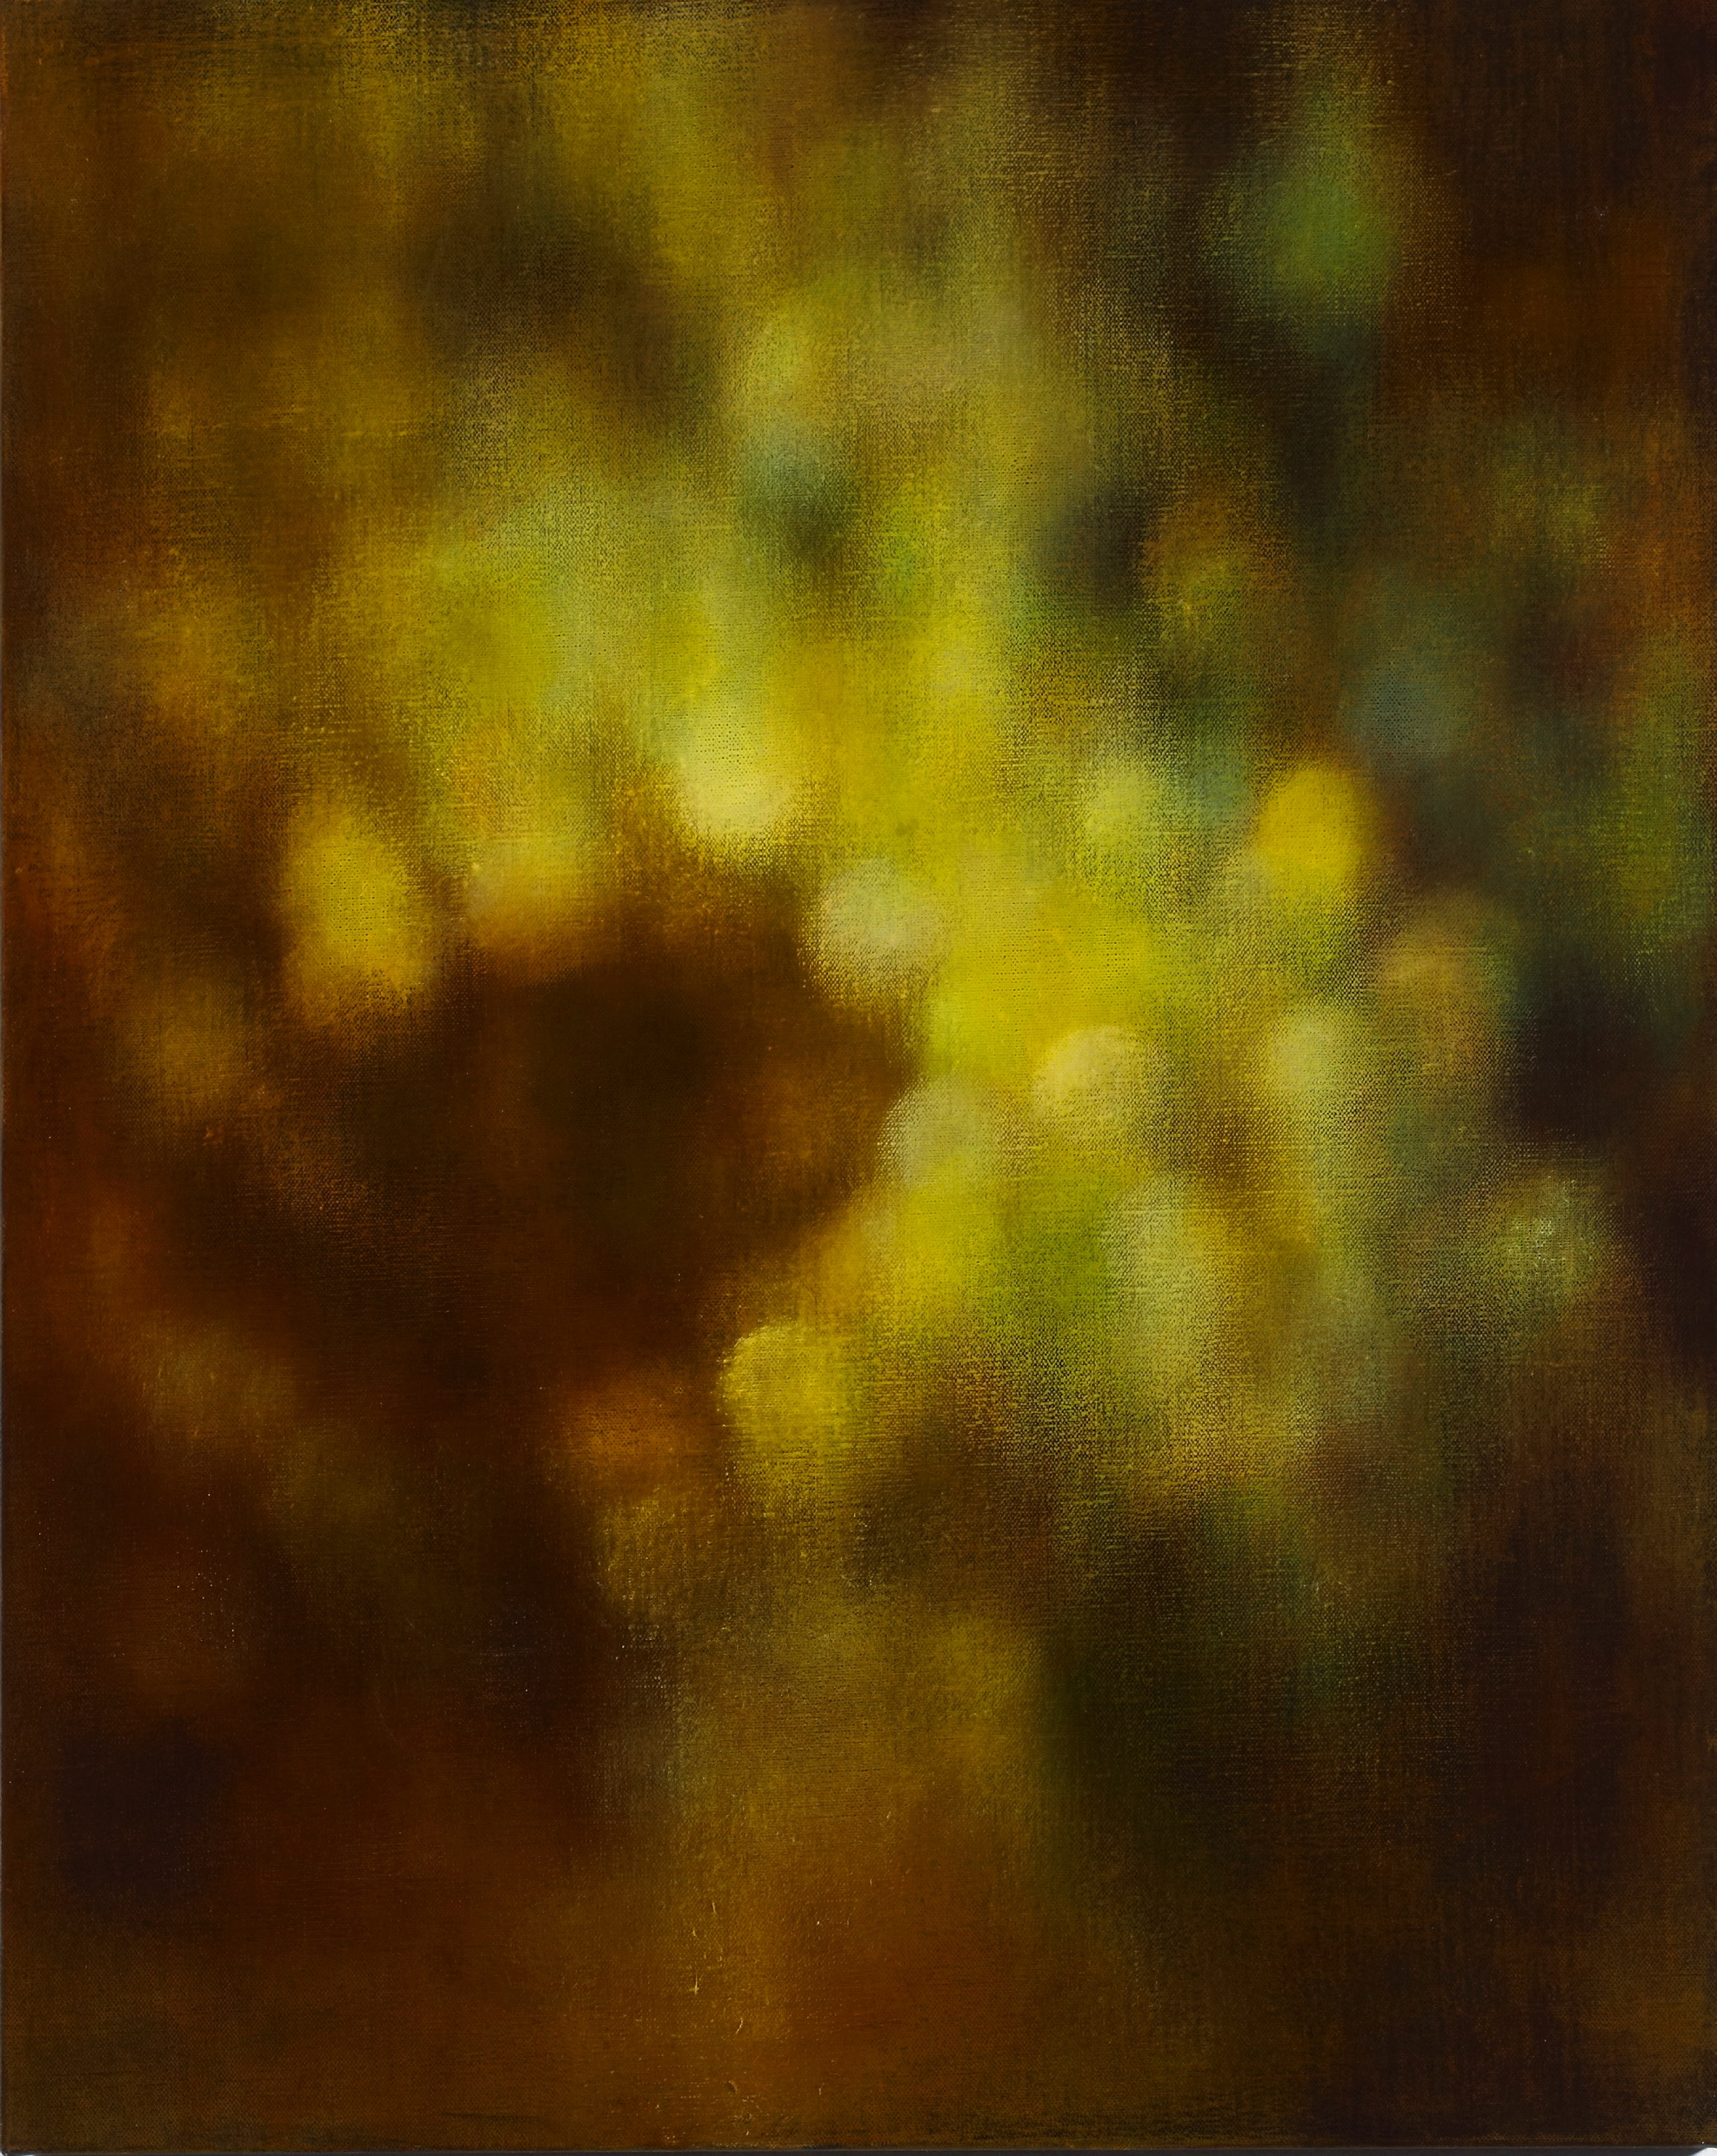 Halo of light, 2012, oil on canvas, 76x61cm